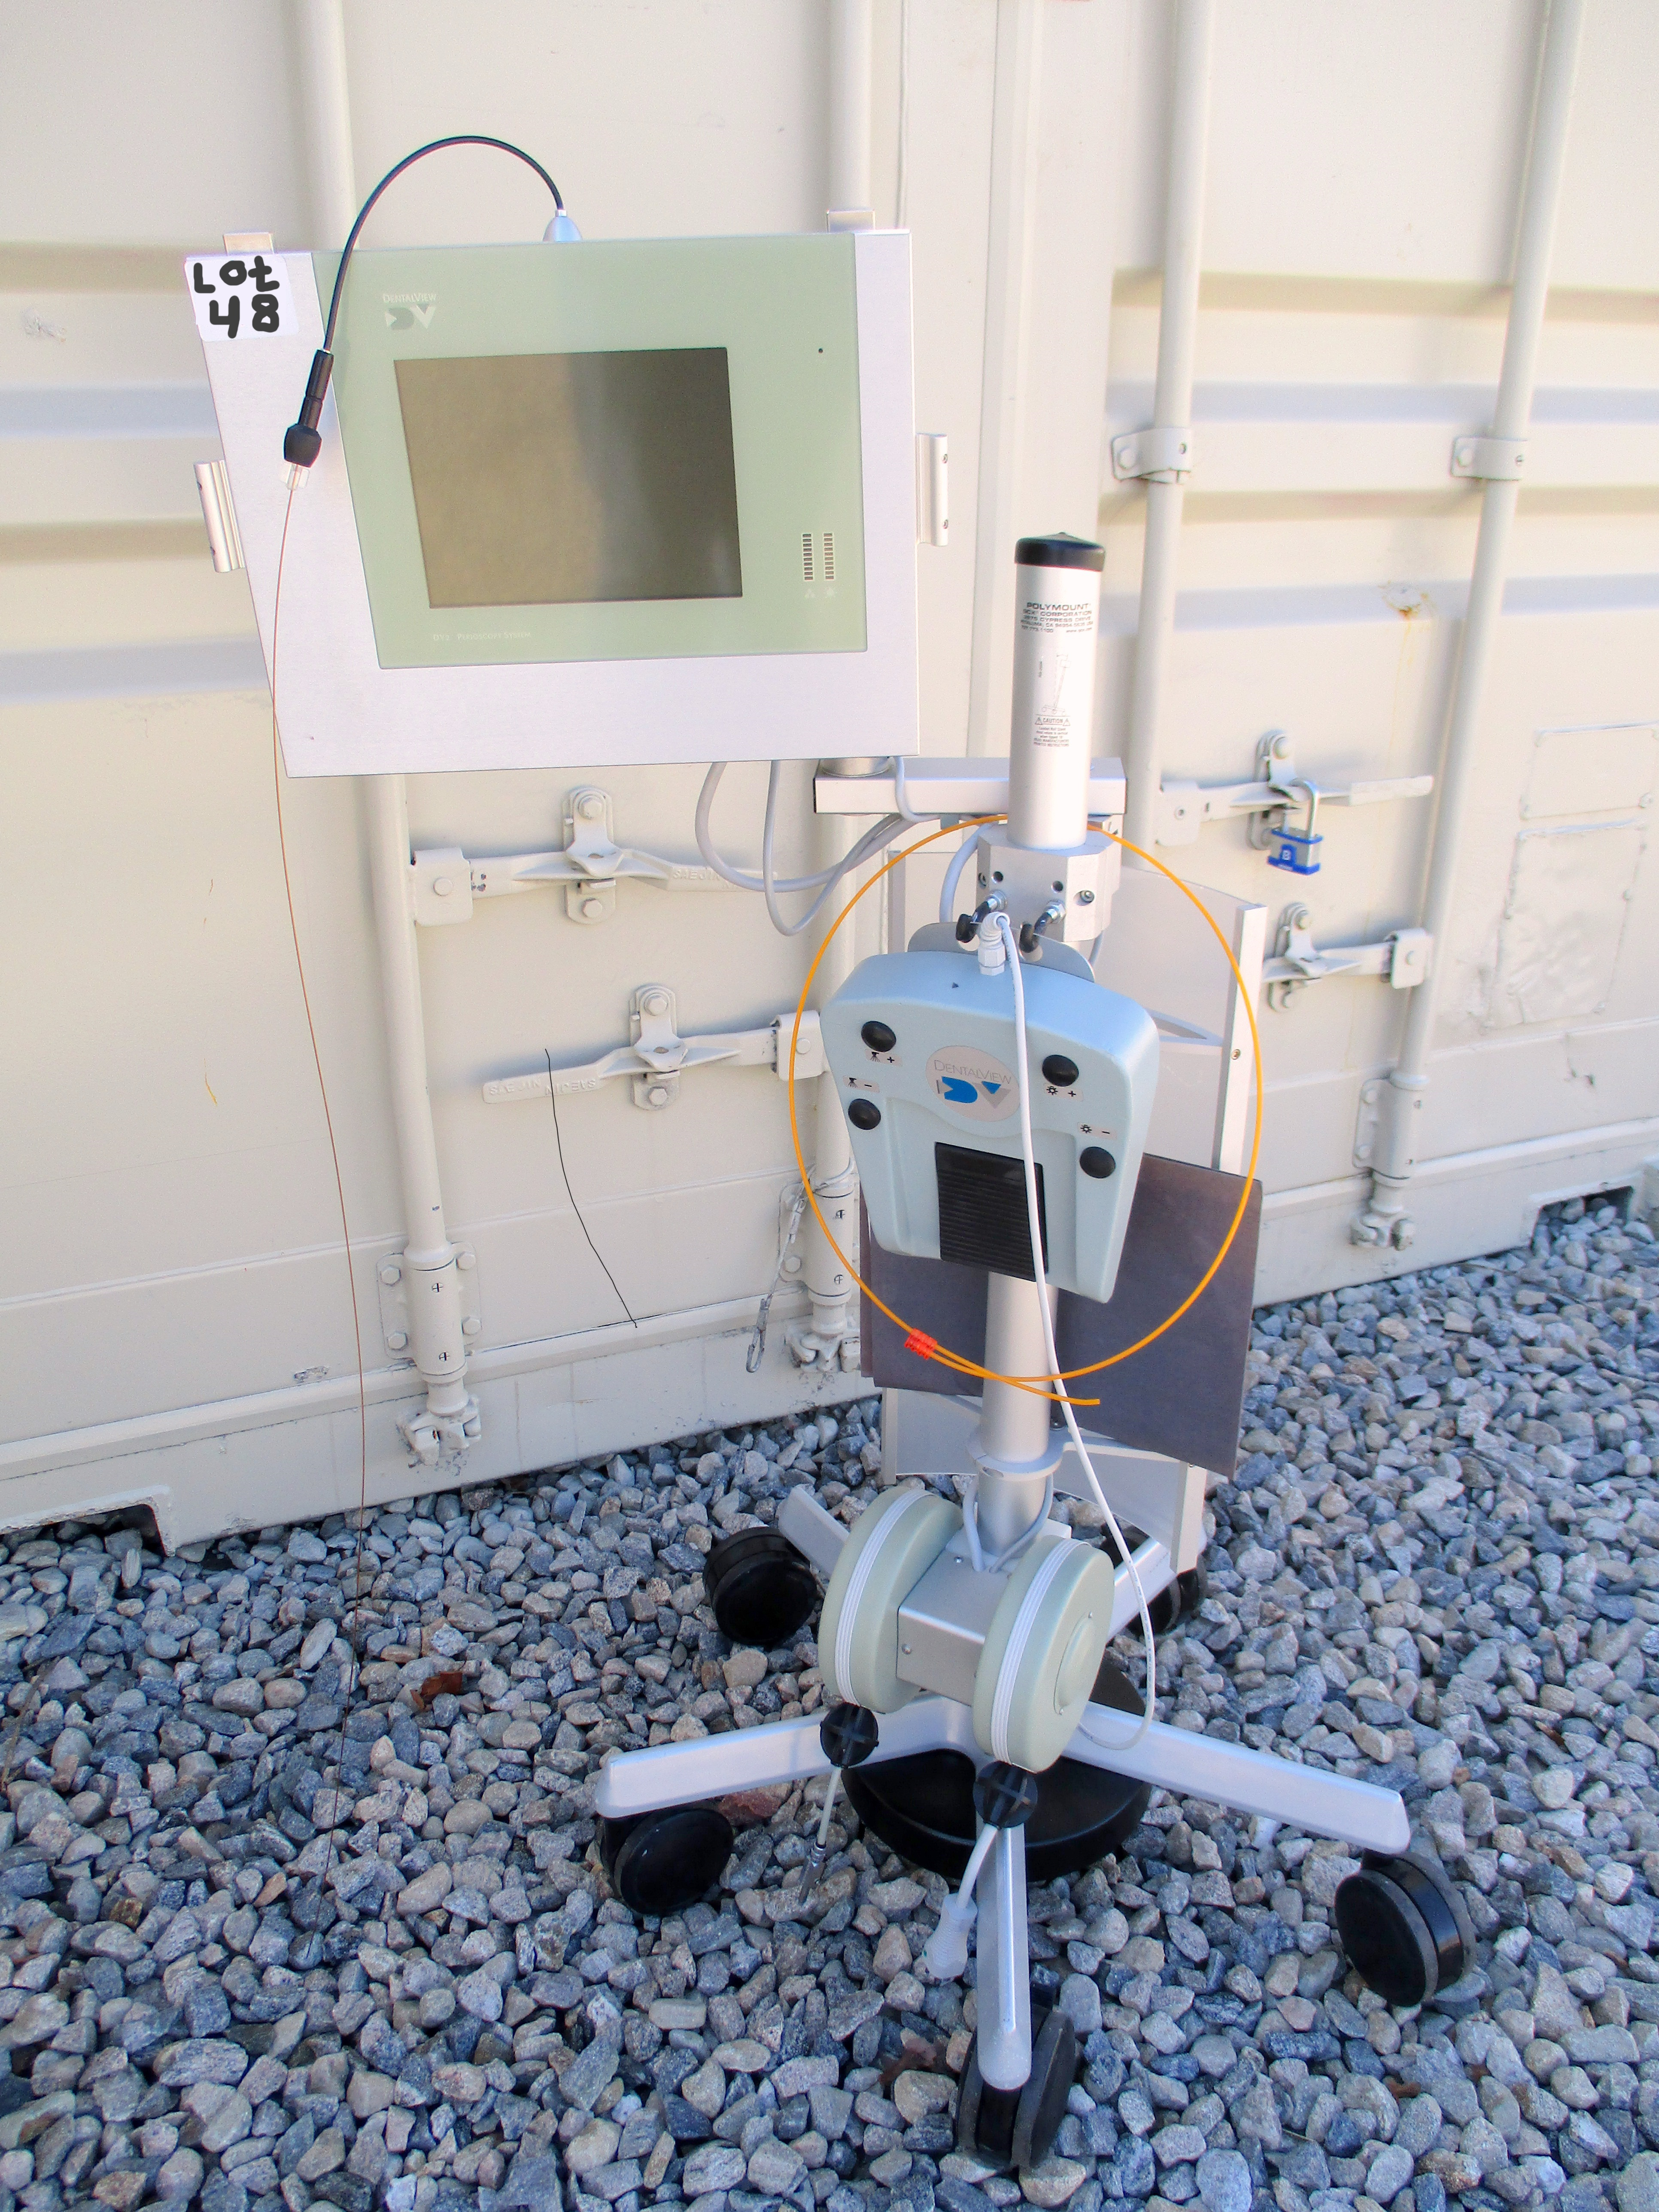 Dental View DV-2 Periscopy Endoscope System on wheeled stand